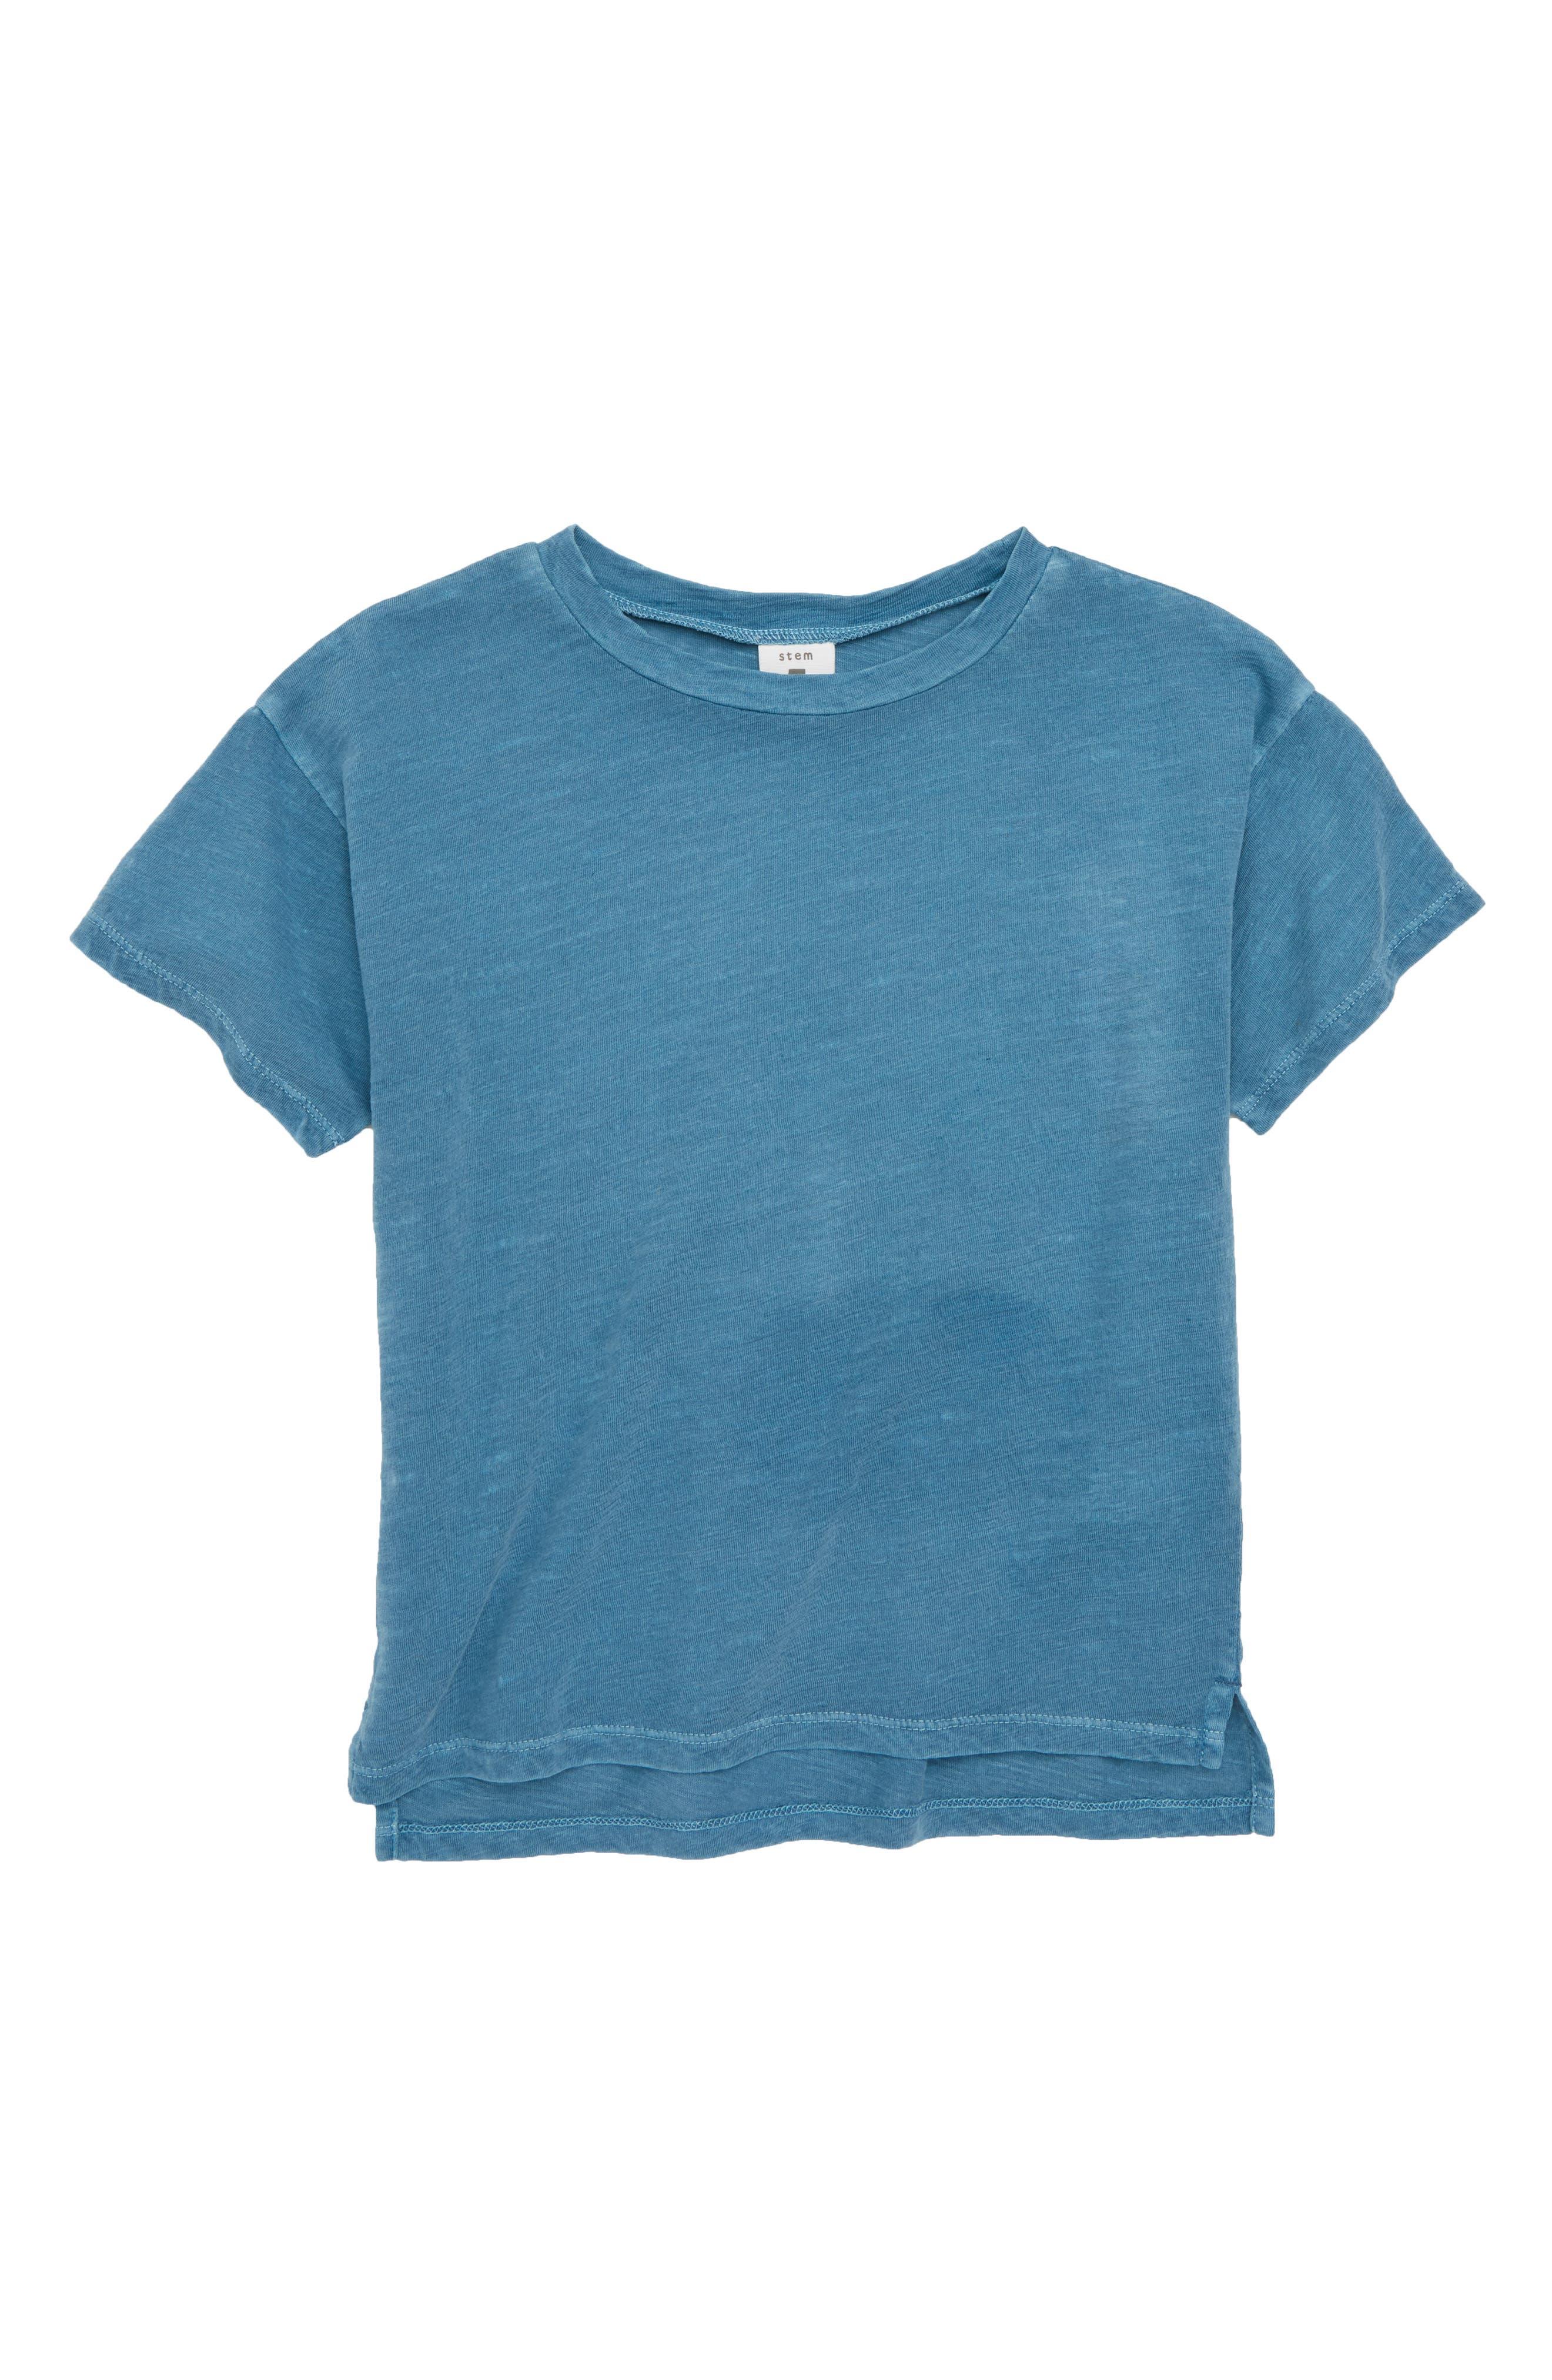 Short Sleeve Cotton T-Shirt,                             Main thumbnail 1, color,                             Blue Stellar